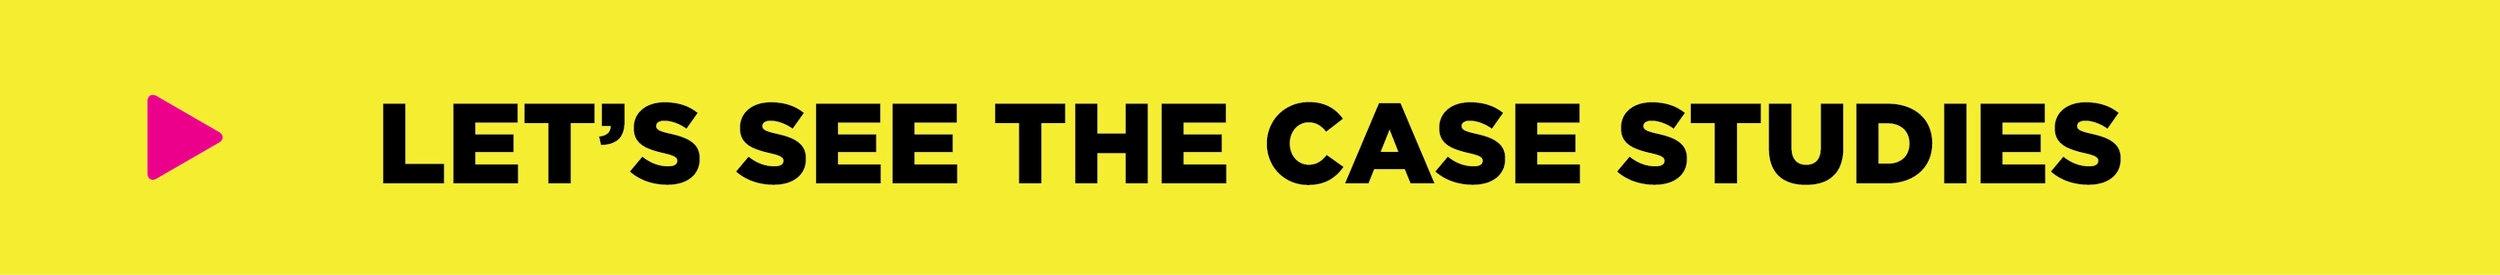 Case-Studies-Banner-Yurika-Creative.jpg